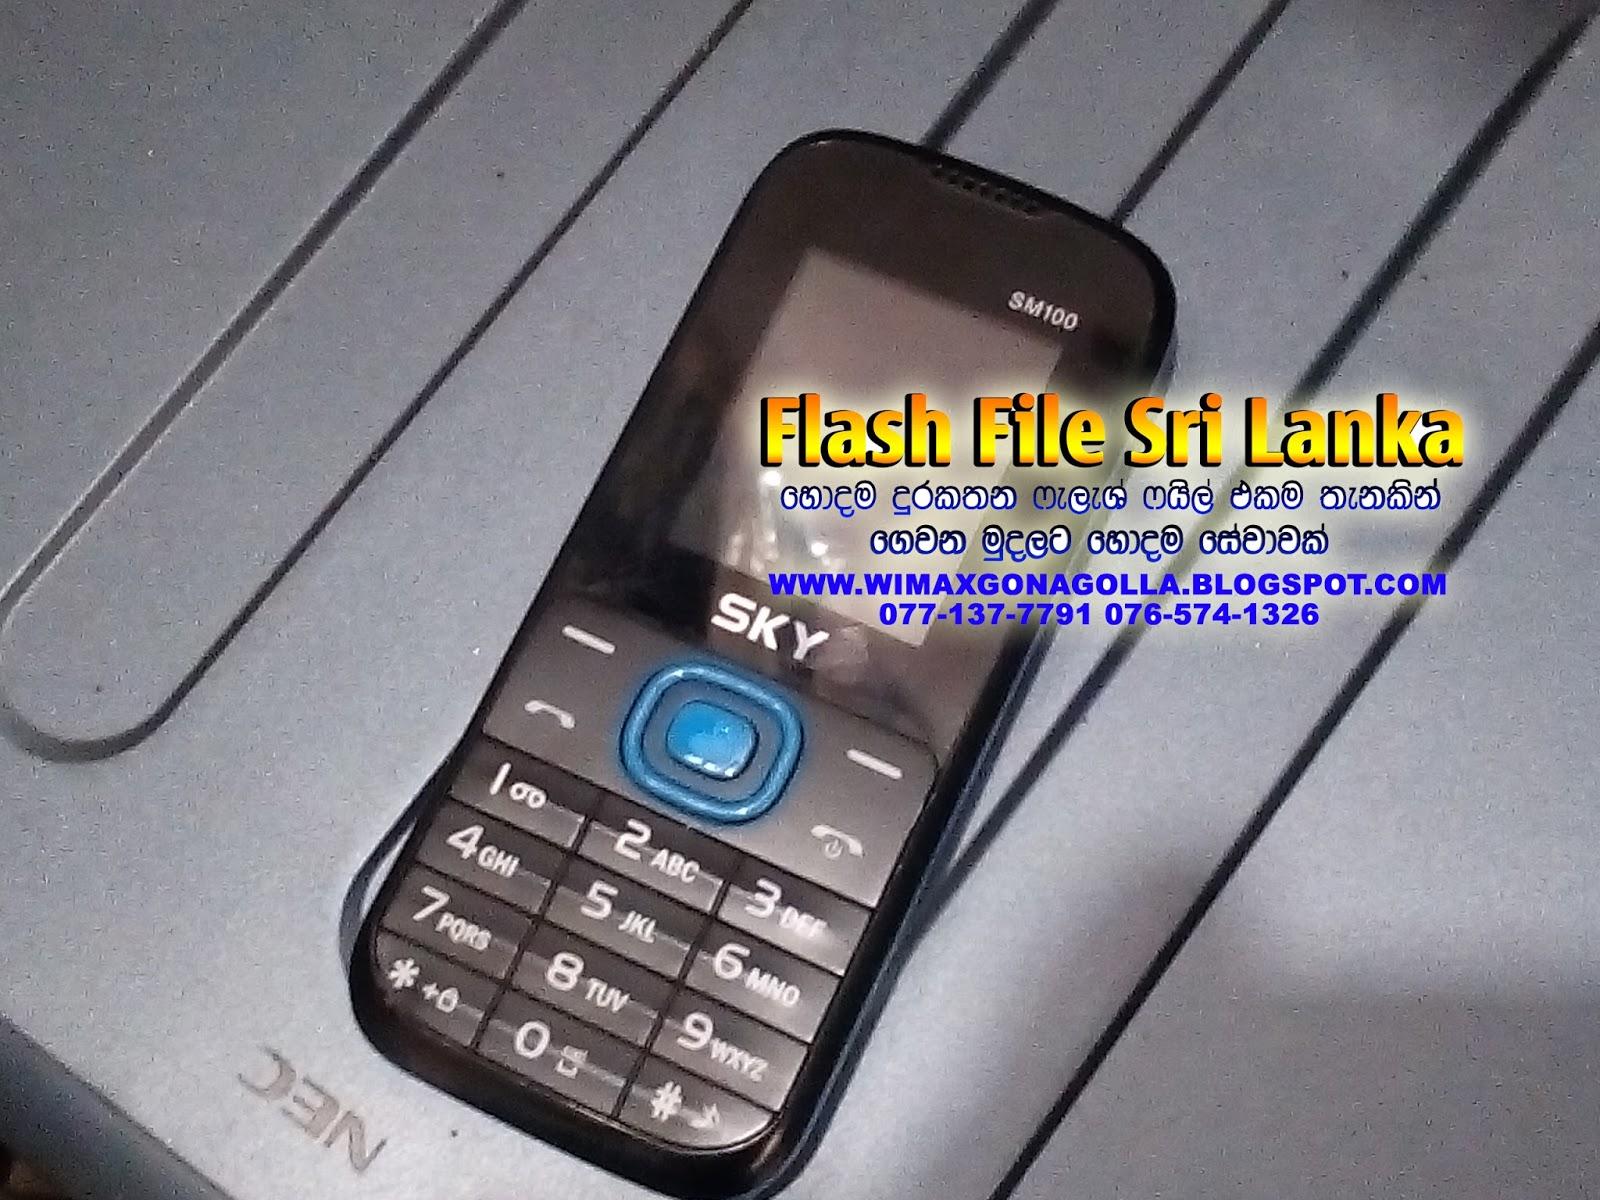 Flash File SriLanka : SKY SM100 SPD6531 Flash File